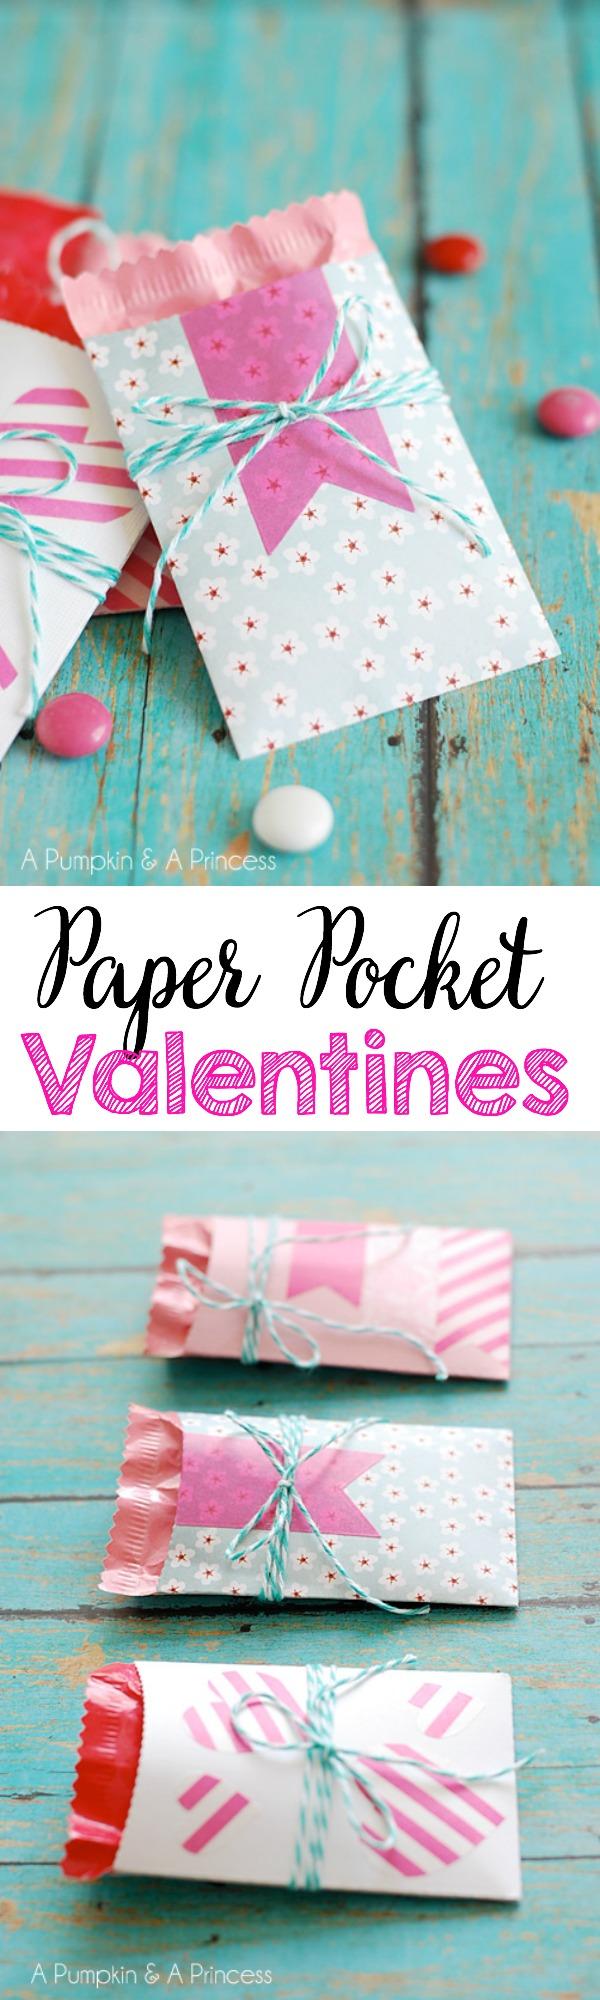 paper pocket valentines